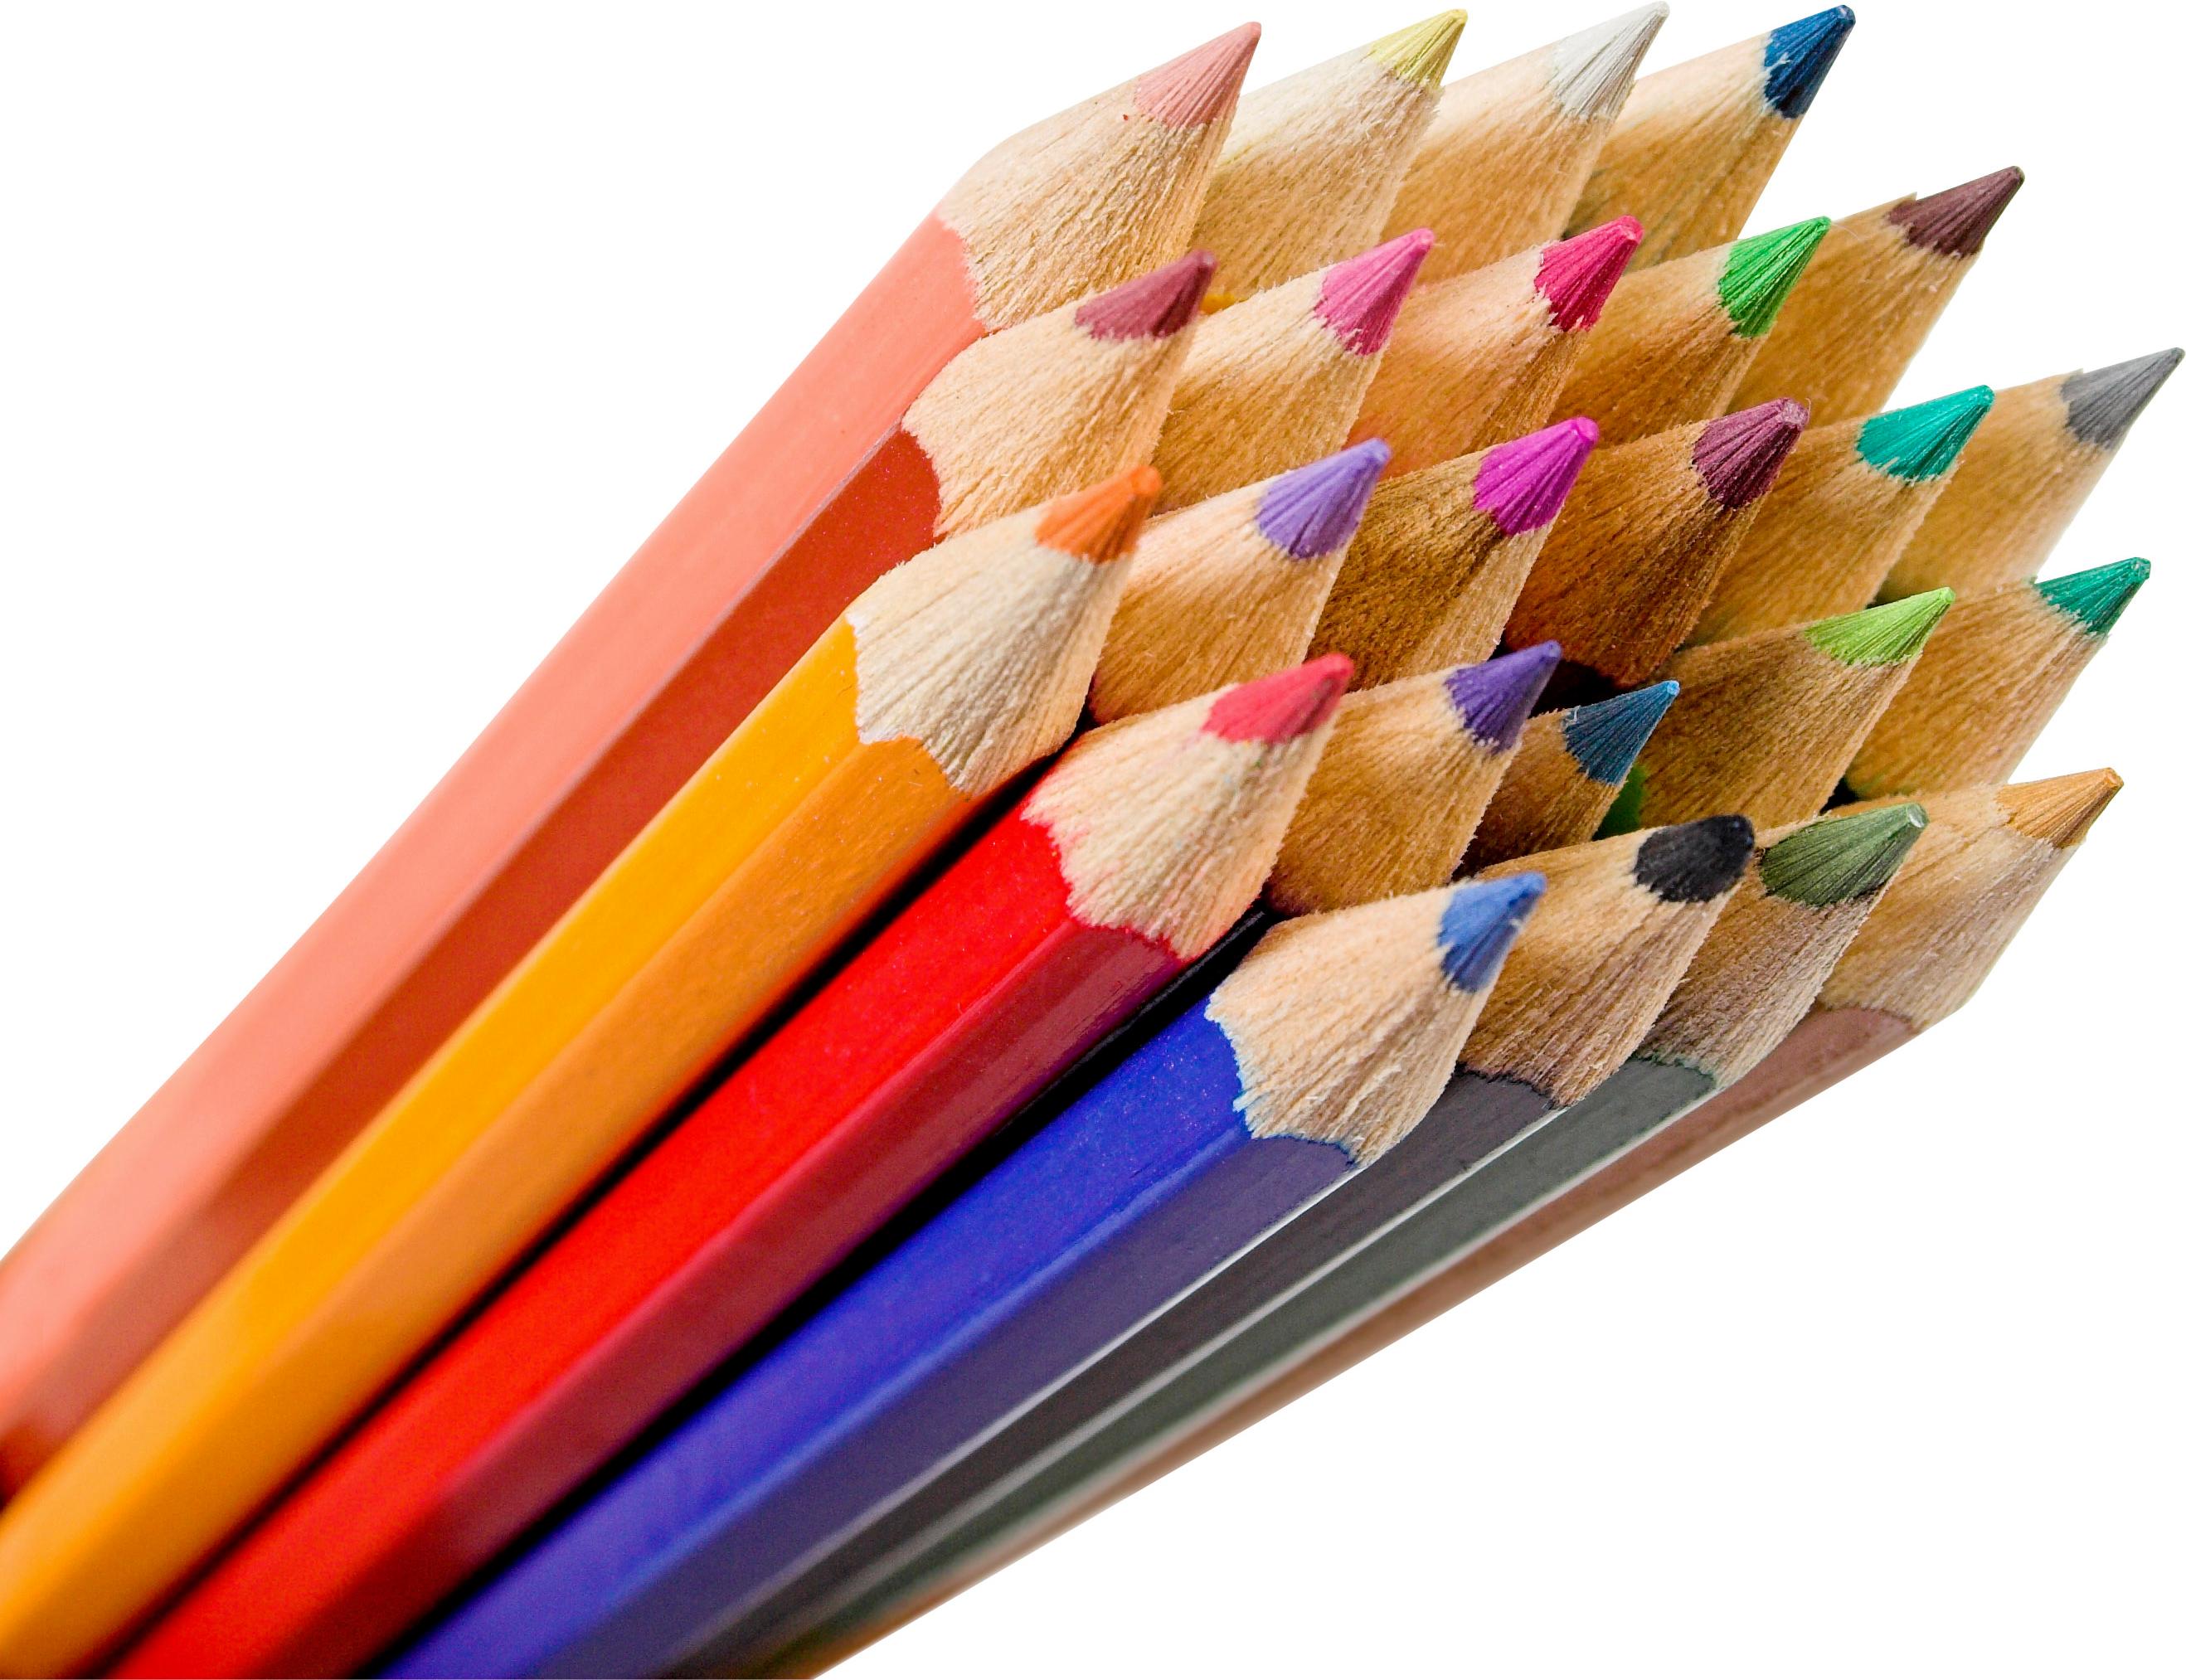 Pencil Png Images Free Download Colored Pencils Pencil Coloured Pencils